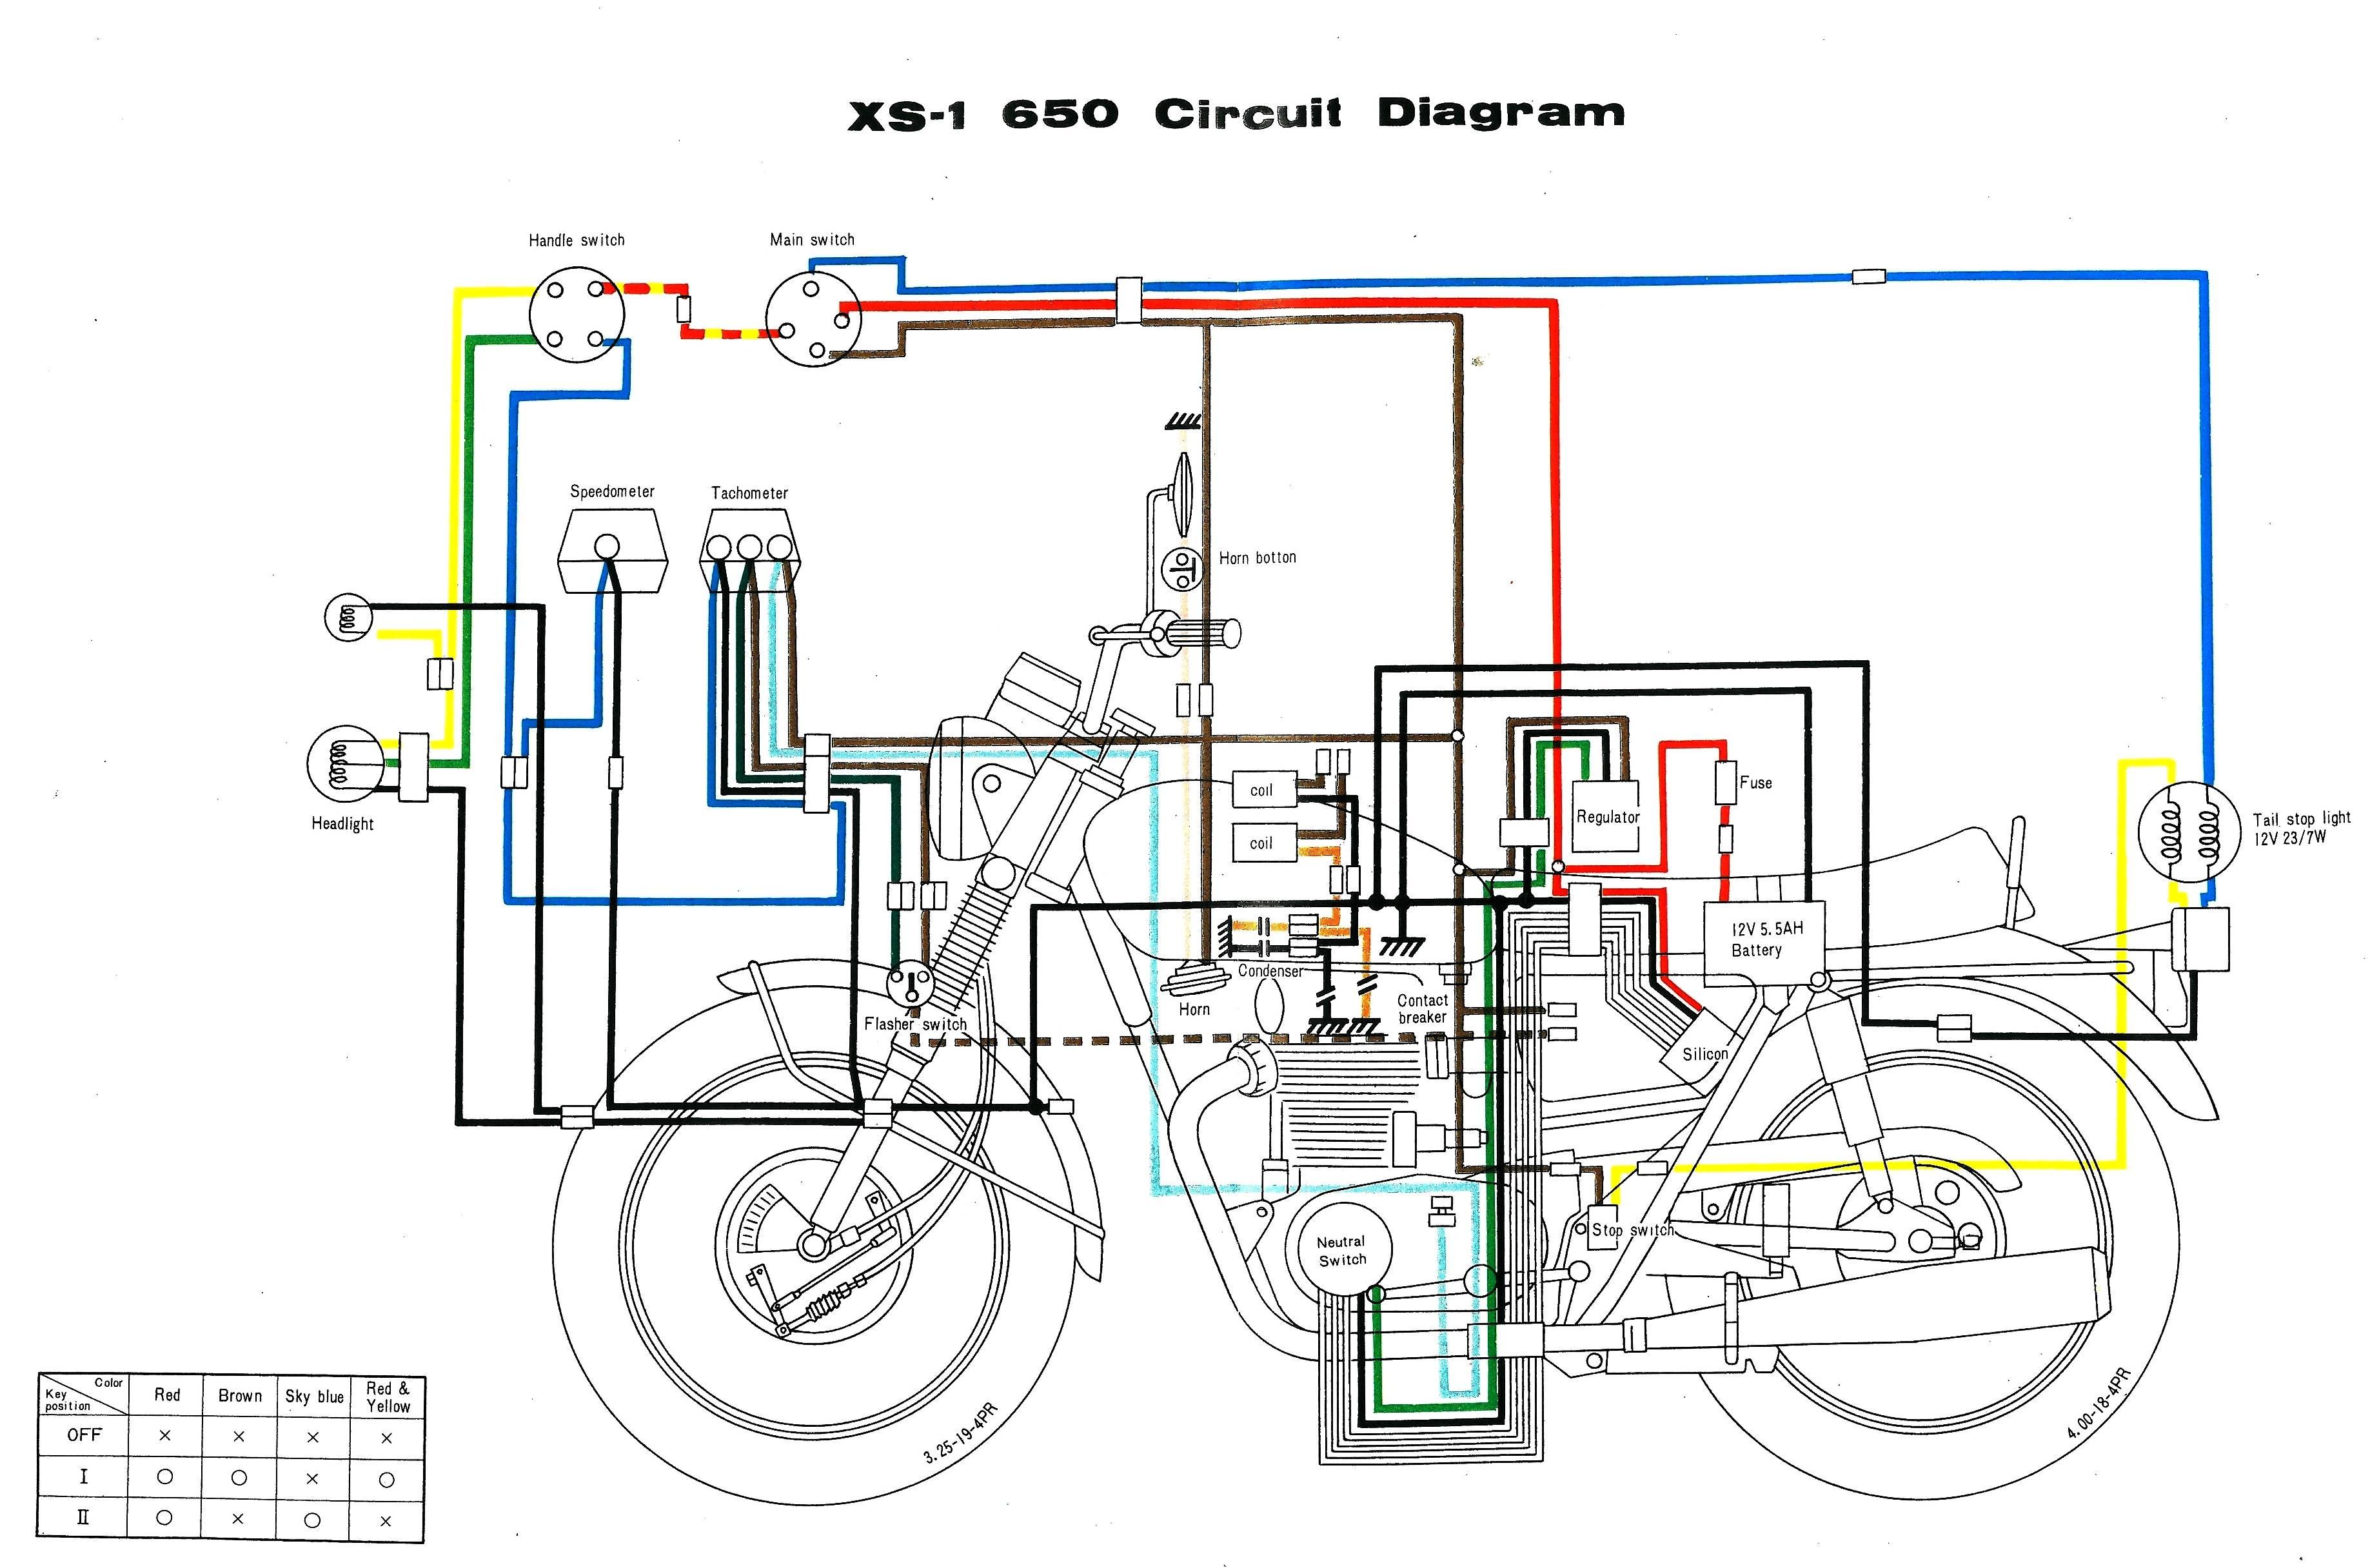 Wiring Diagram Add Schematic Auto Electrical Toshiba G7